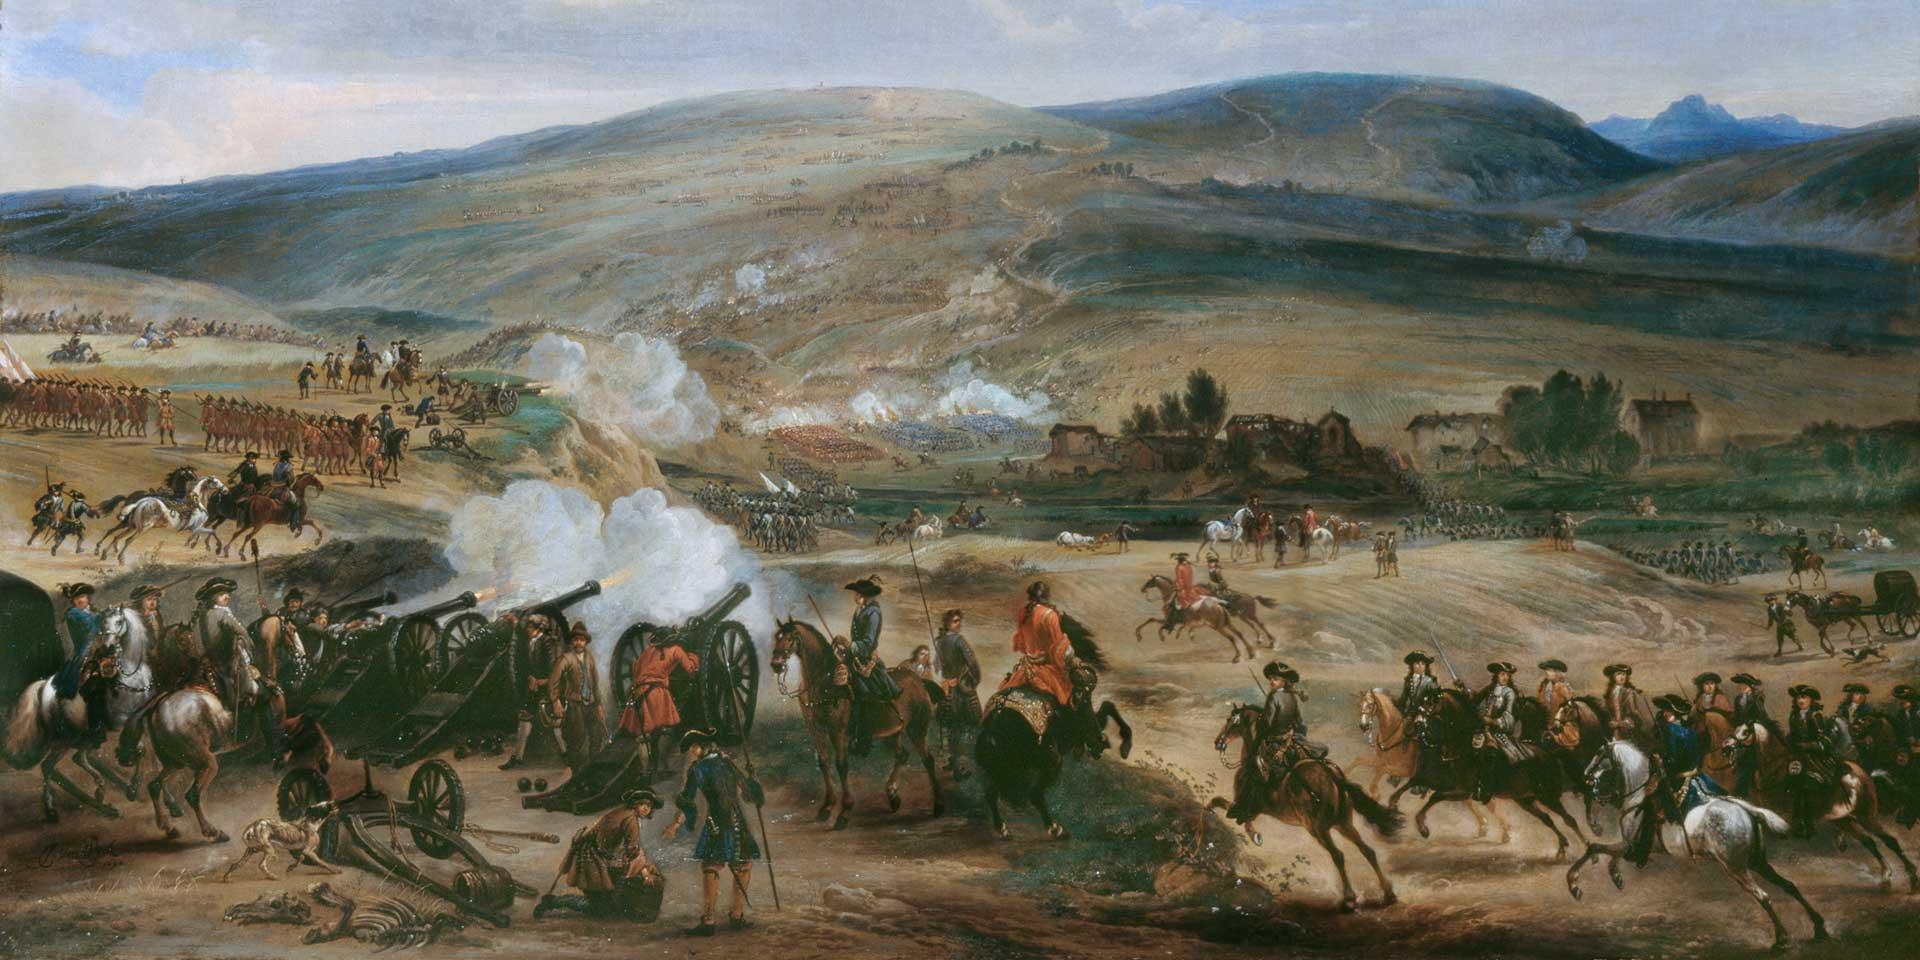 The Battle of the Boyne, 1690